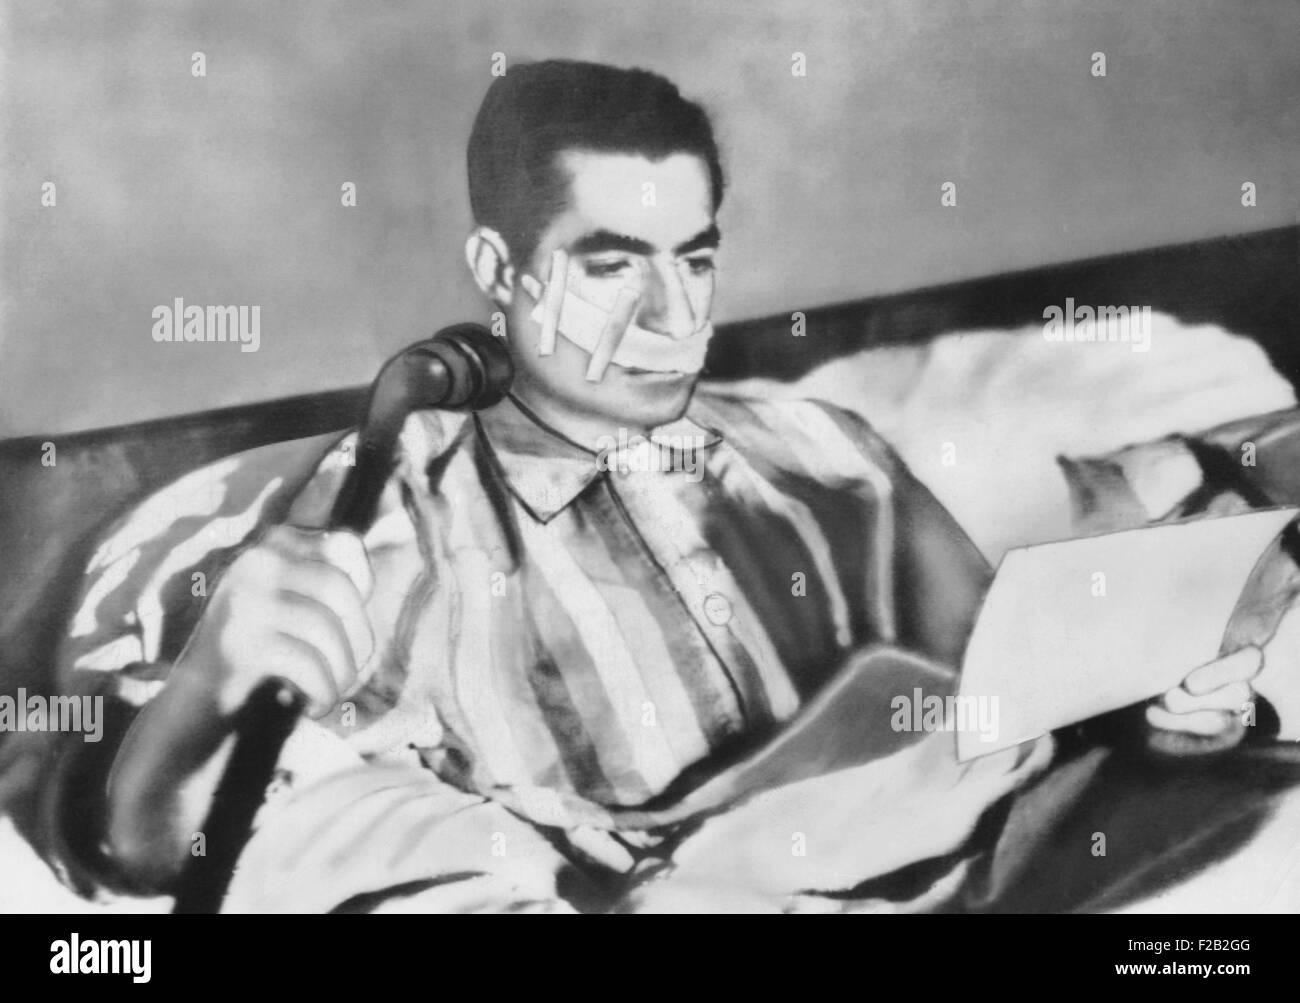 Shah of Iran after an assassination attempt on Feb. 4, 1949. Fakhr-Arai fired five shots from ten feet away but - Stock Image